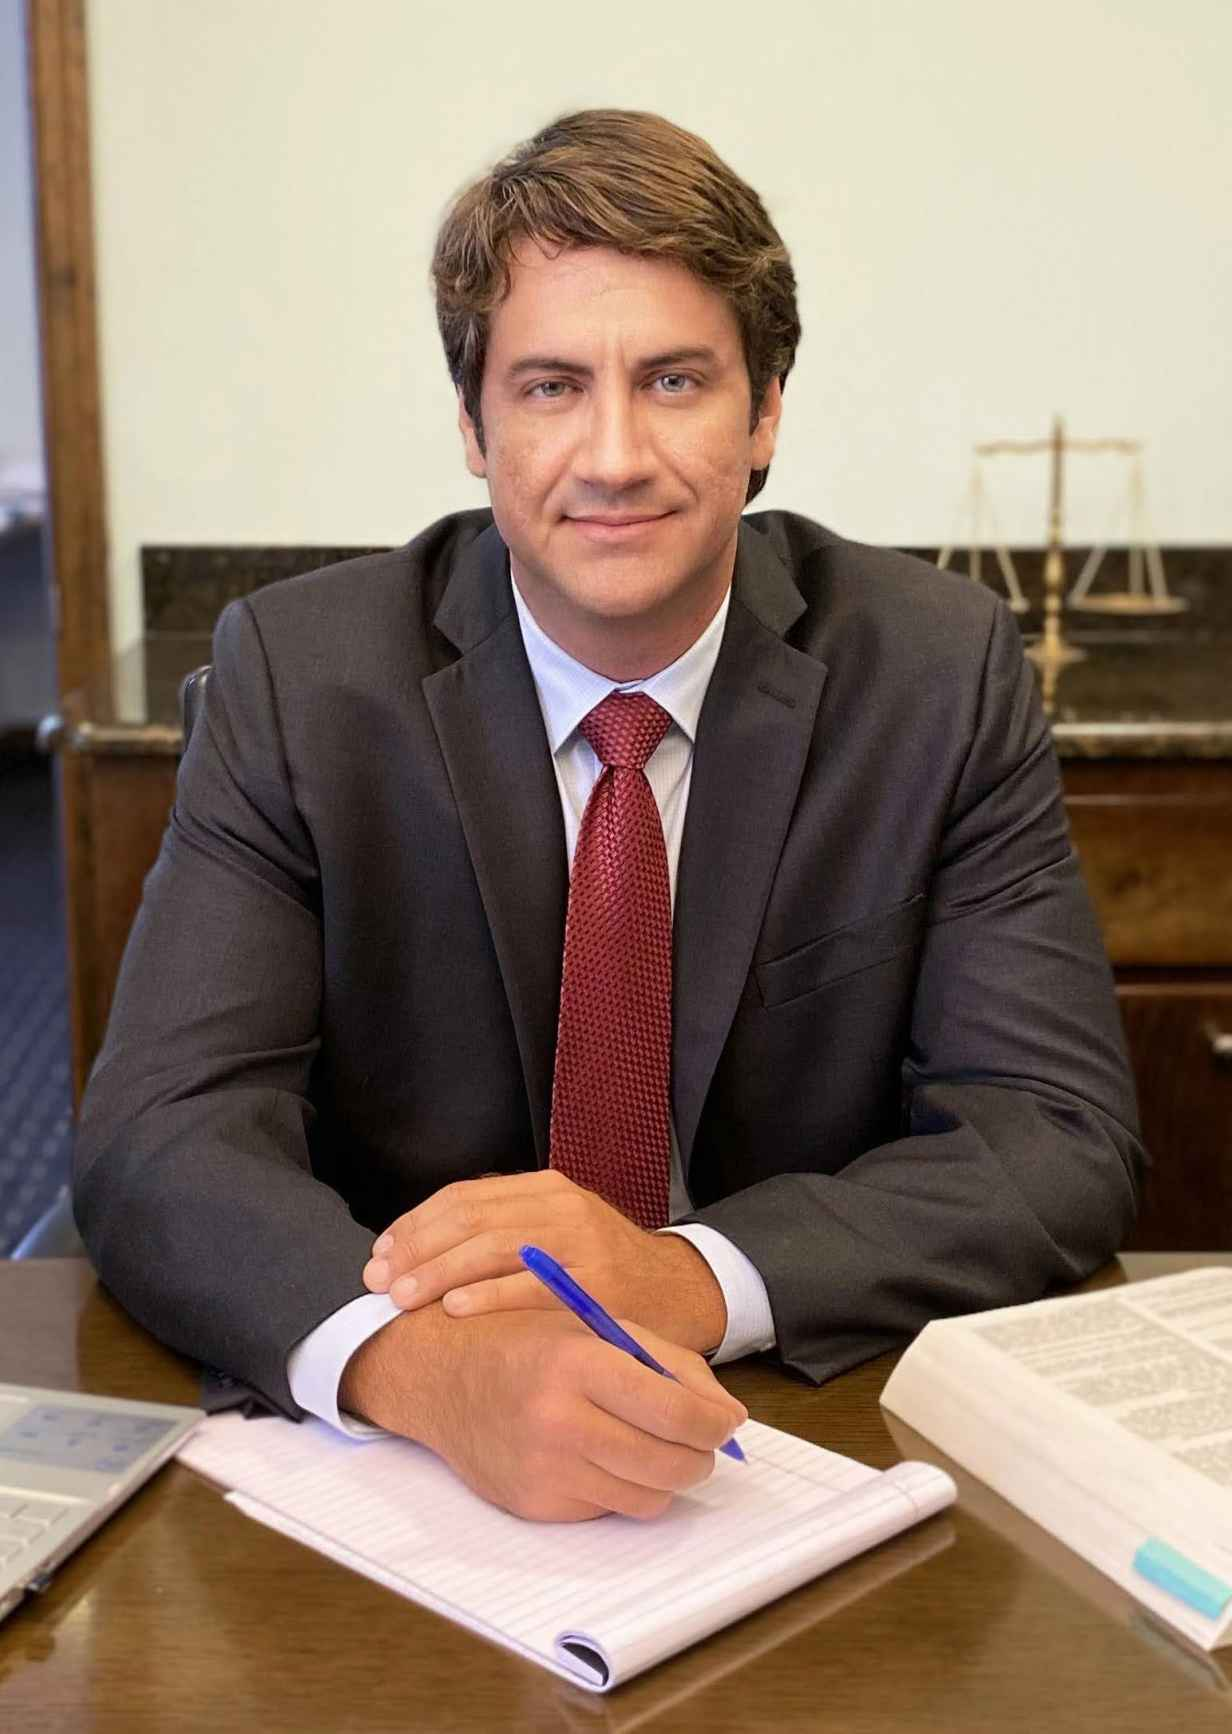 Ron Hertel has opened Hertel Legal in Ormond Beach